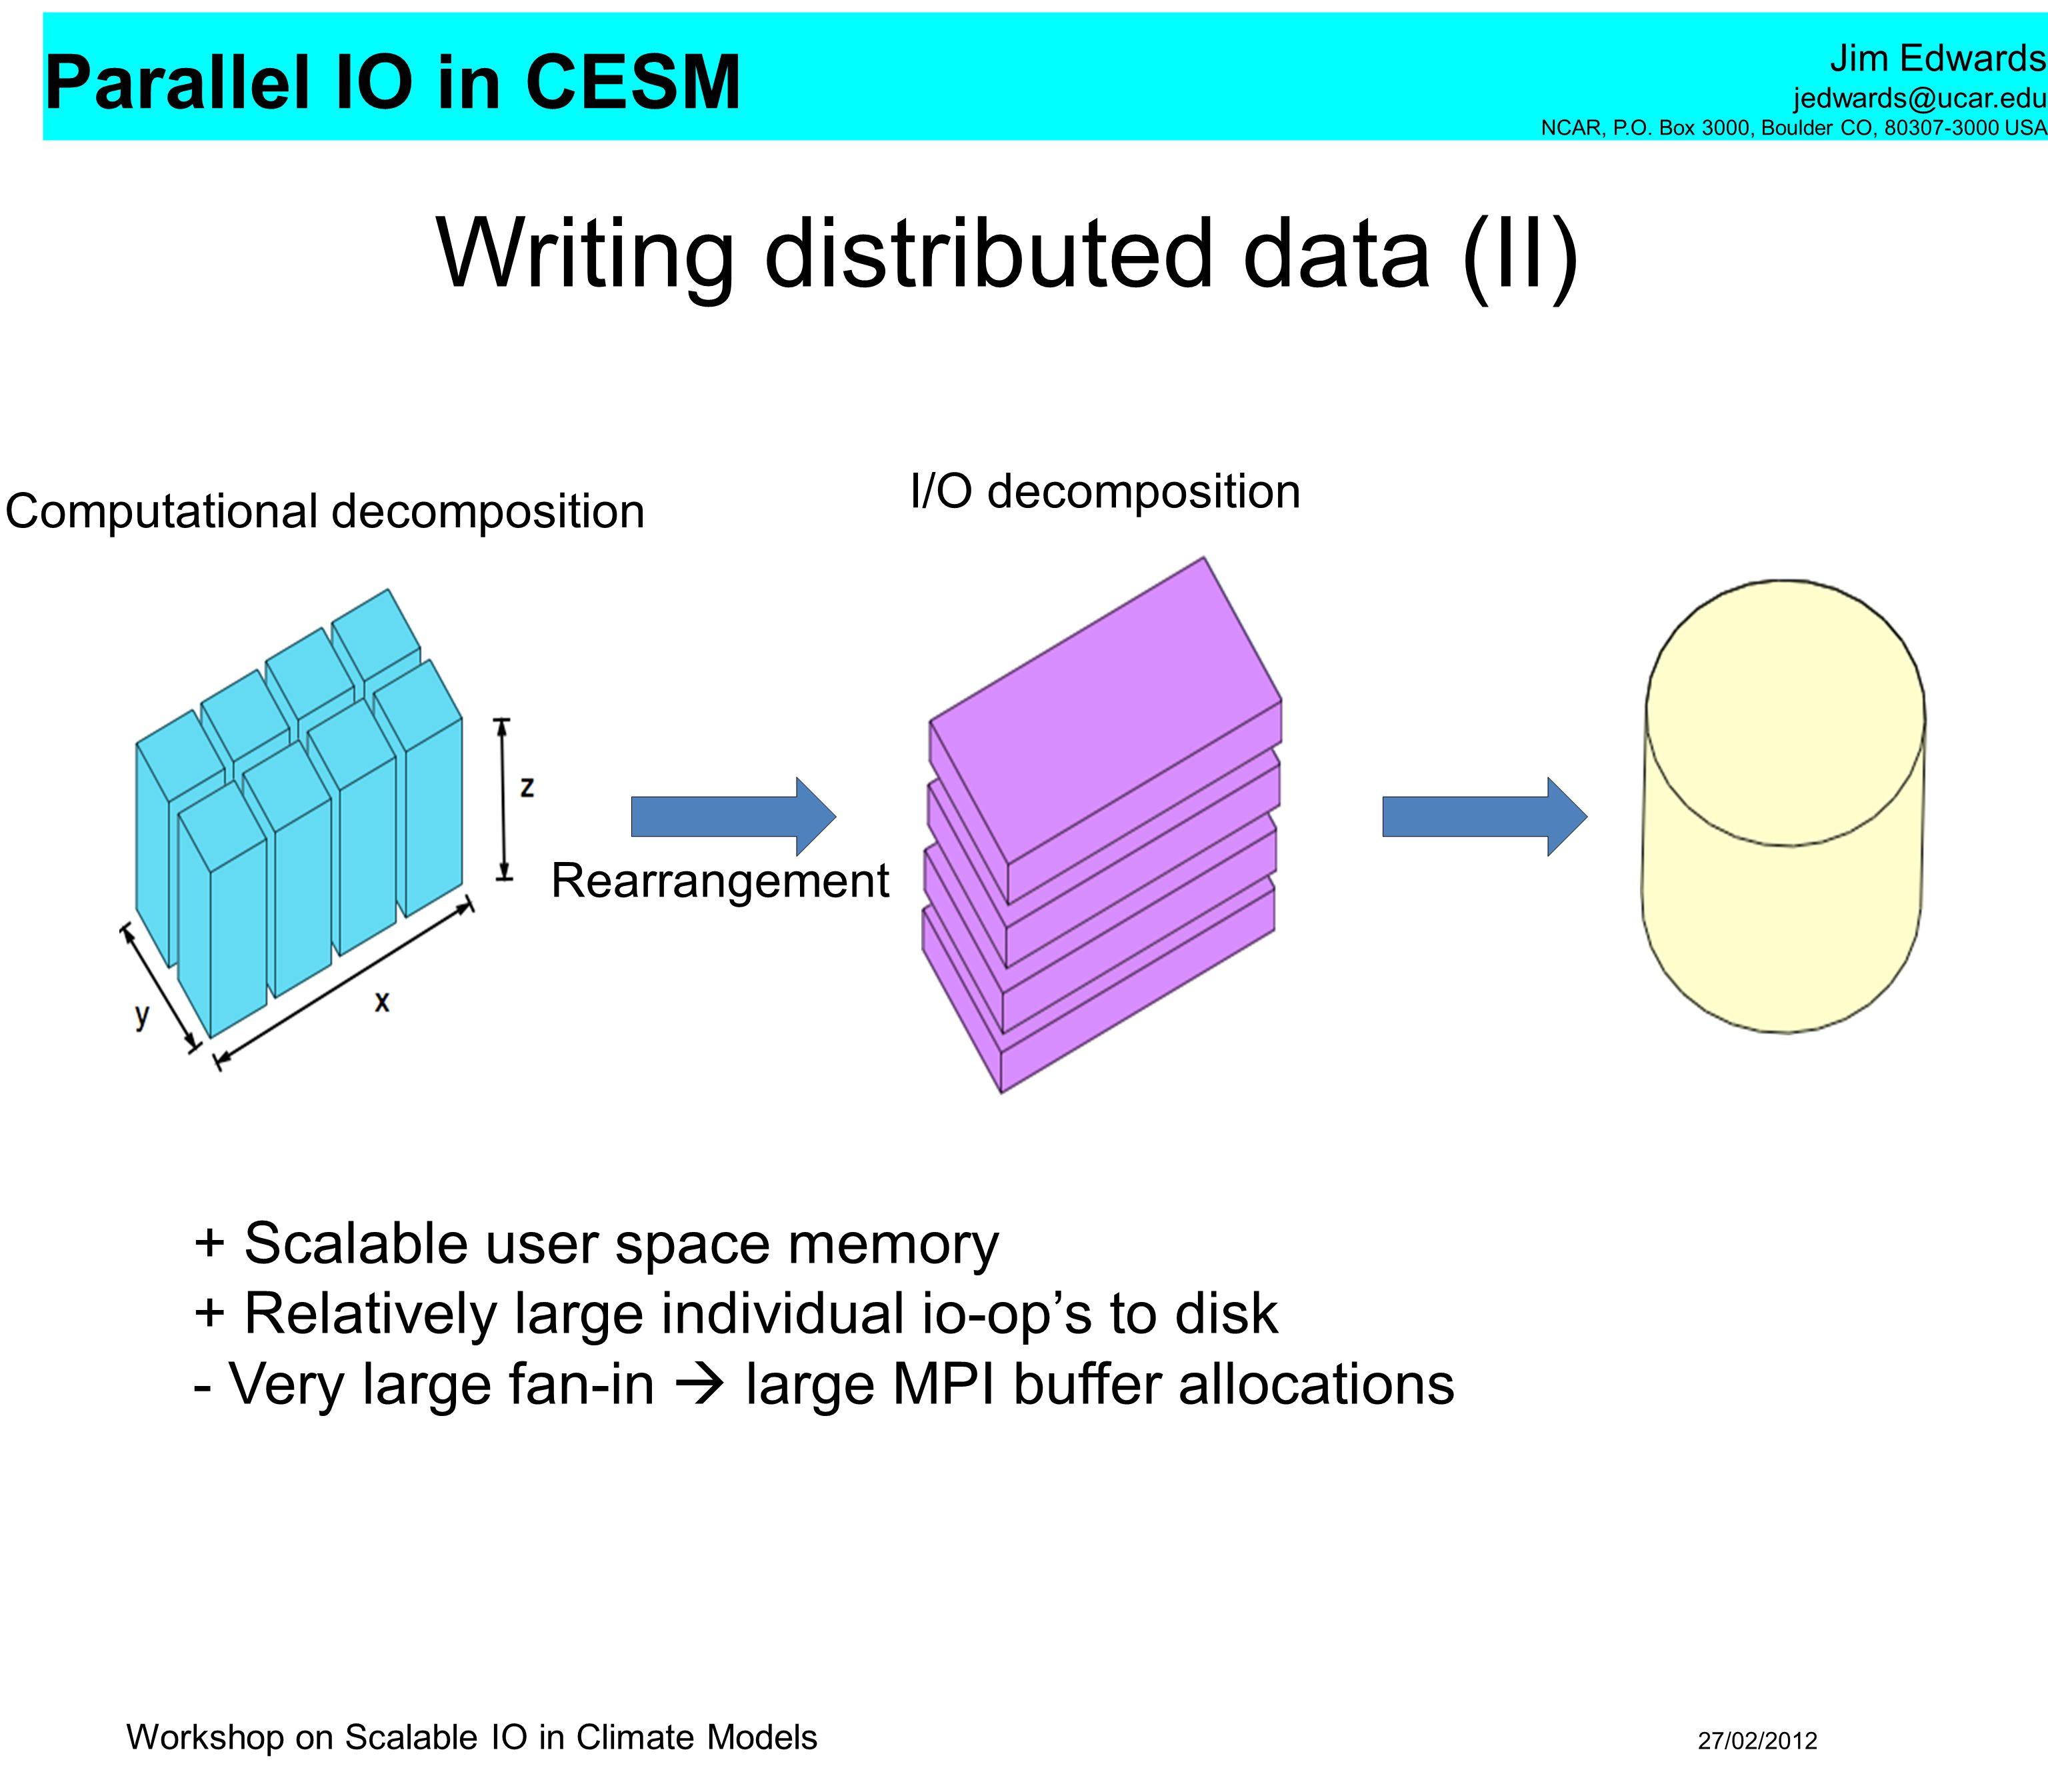 Writing distributed data (II)